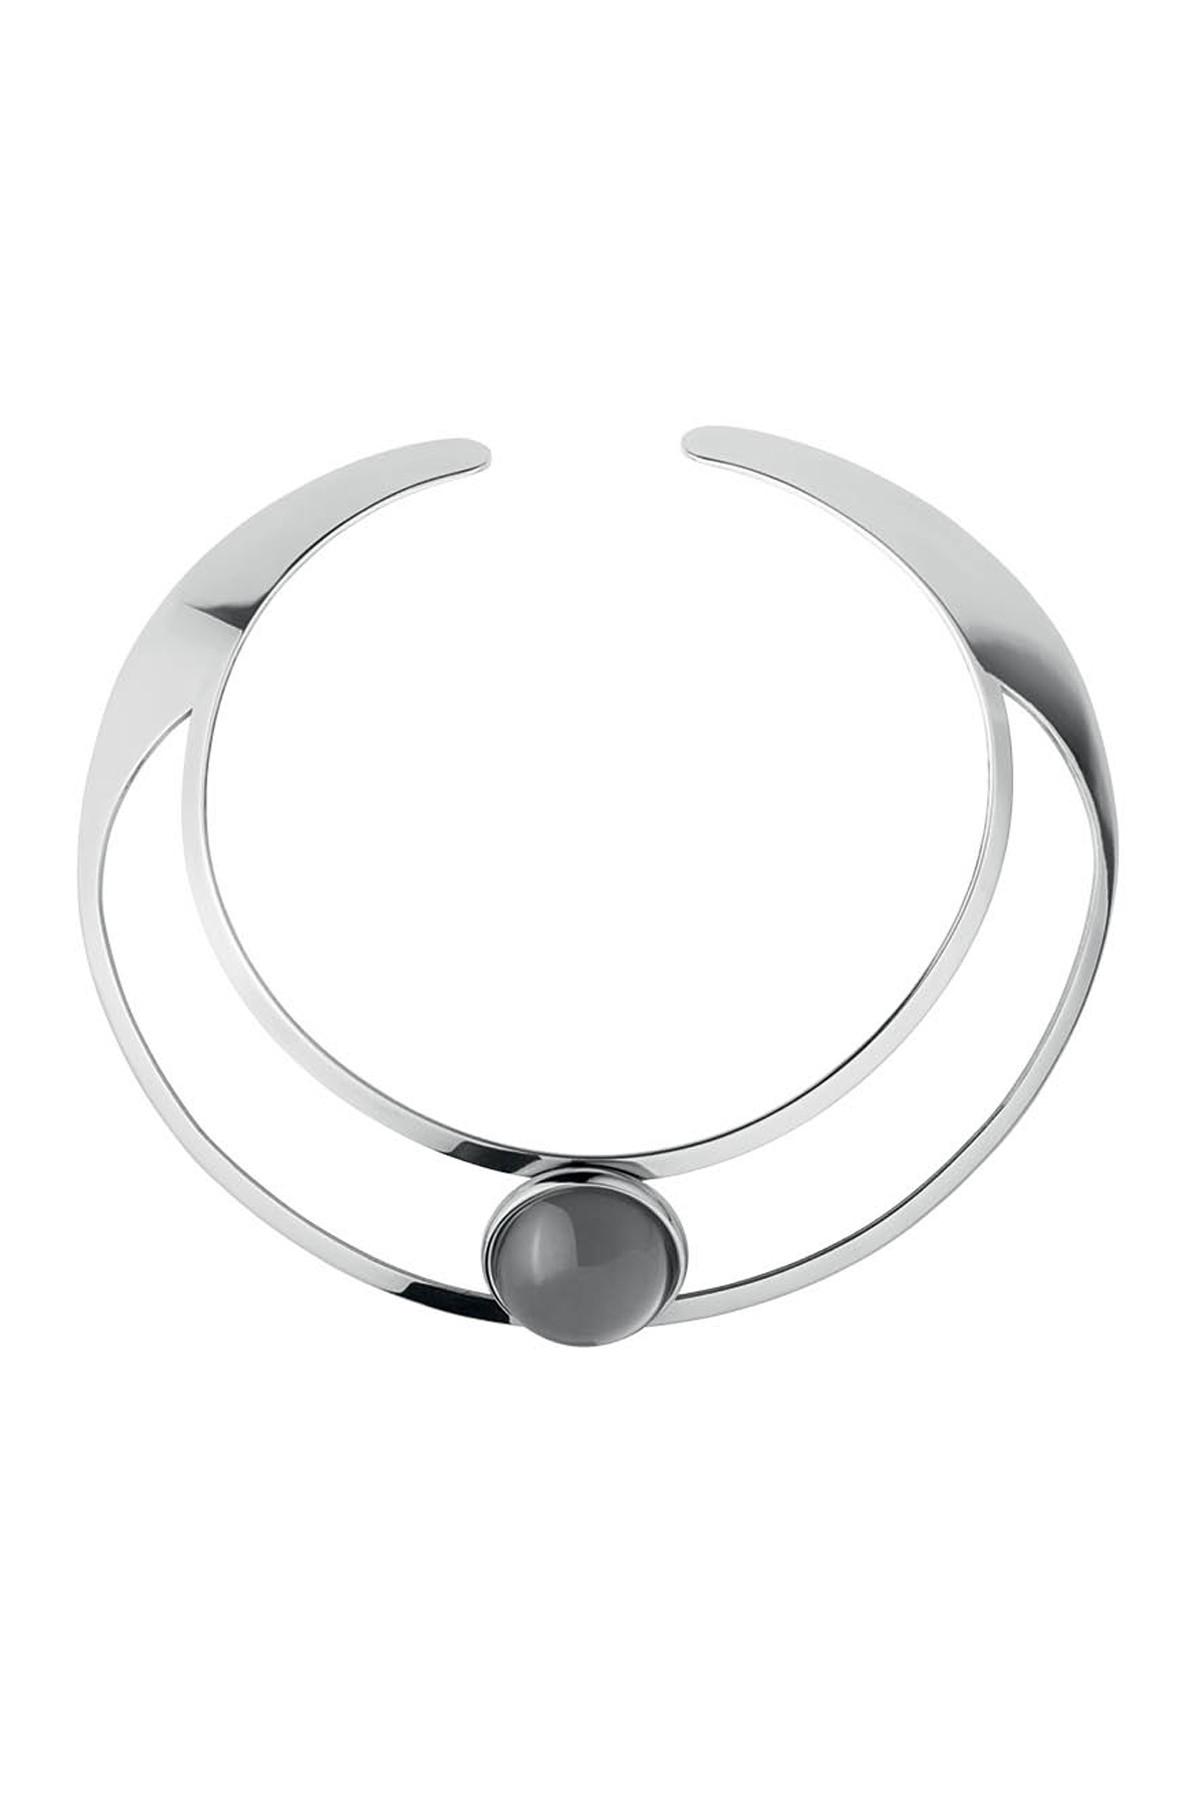 Image of   DYRBERG/KERN BAGOT HALSKÆDE 337819 (Silver, Grey, ONESIZE)